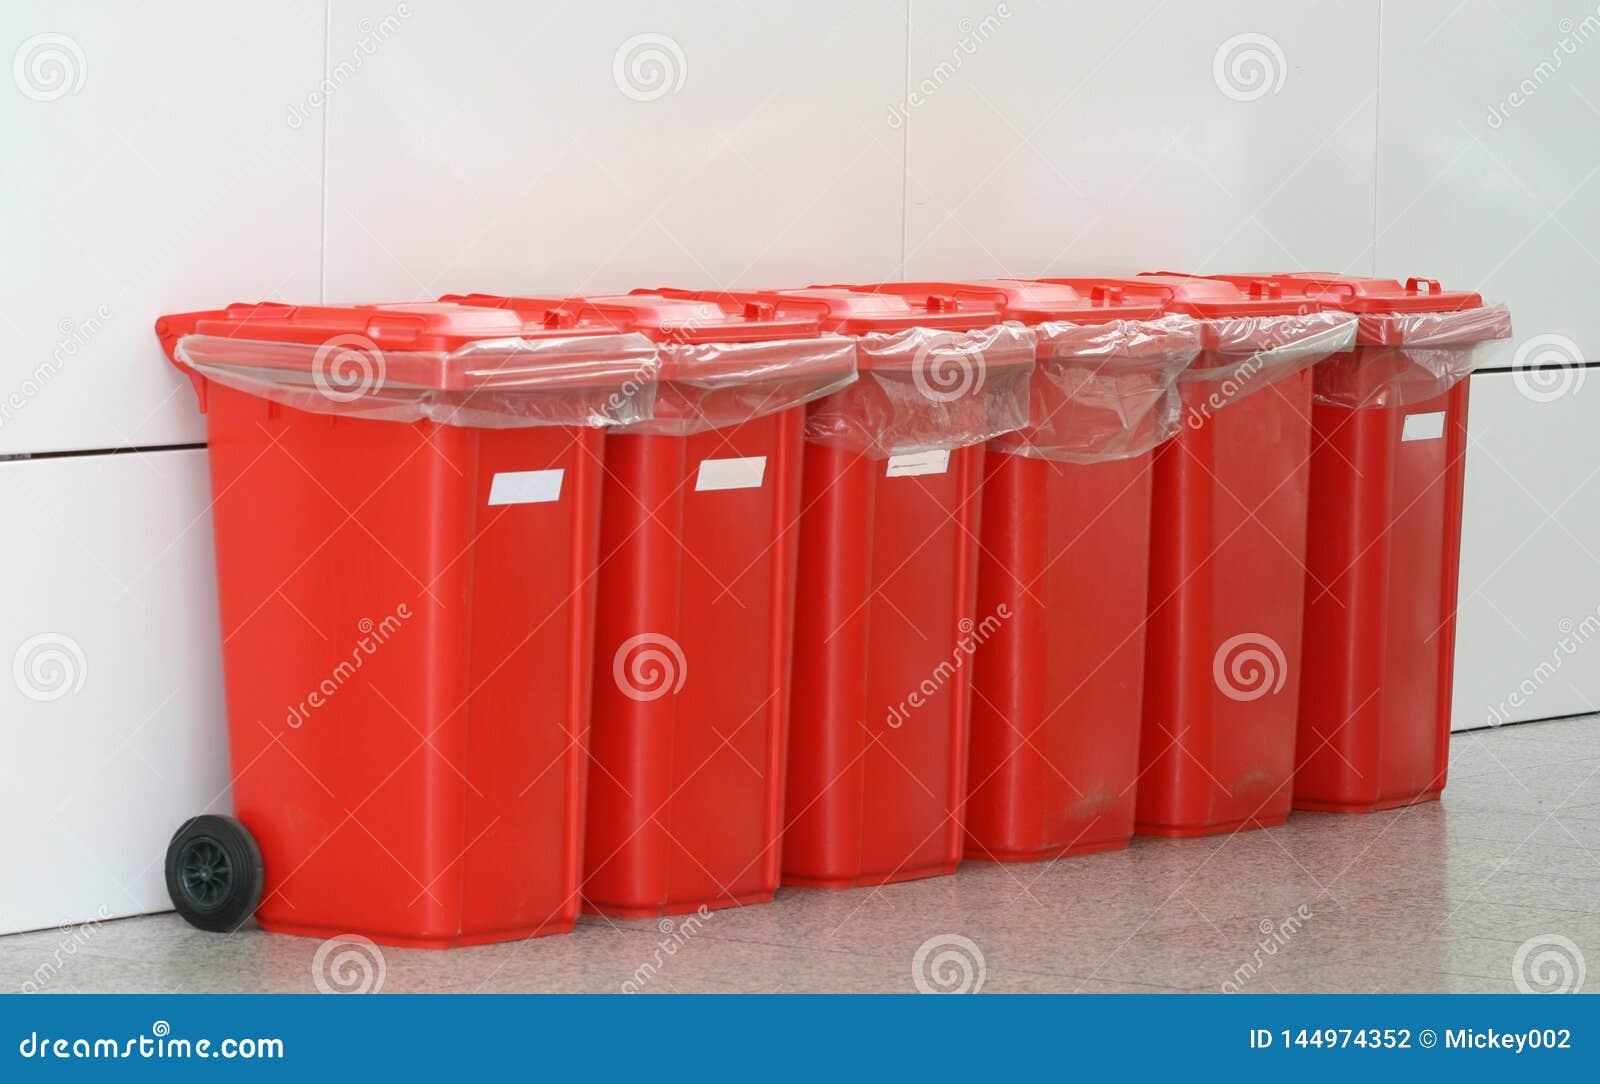 Red plastic bins